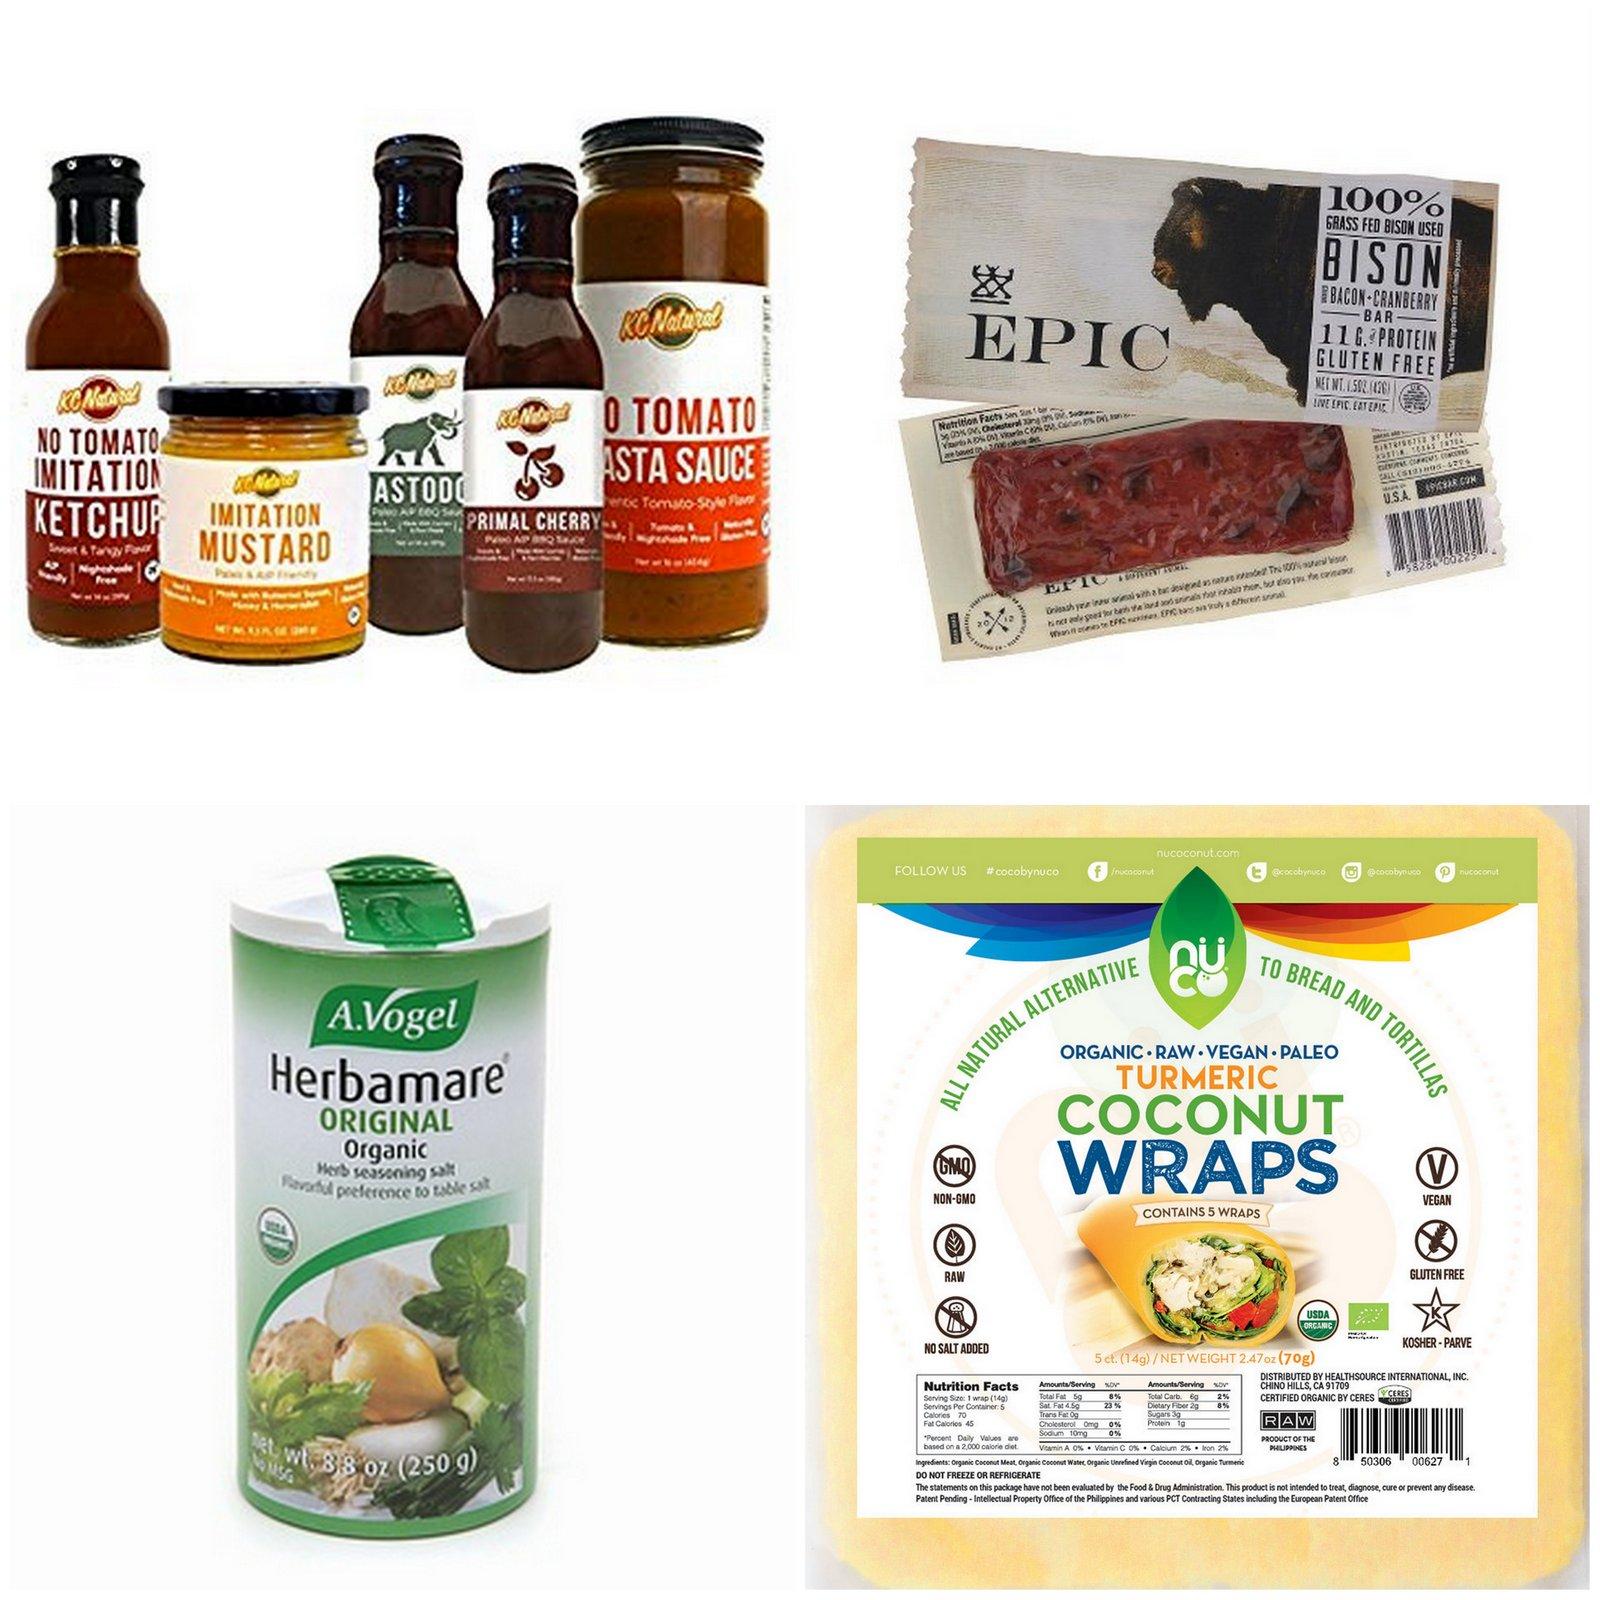 Healing Store - Paleo AIP Ingredients & Convenience Foods | Phoenix Helix